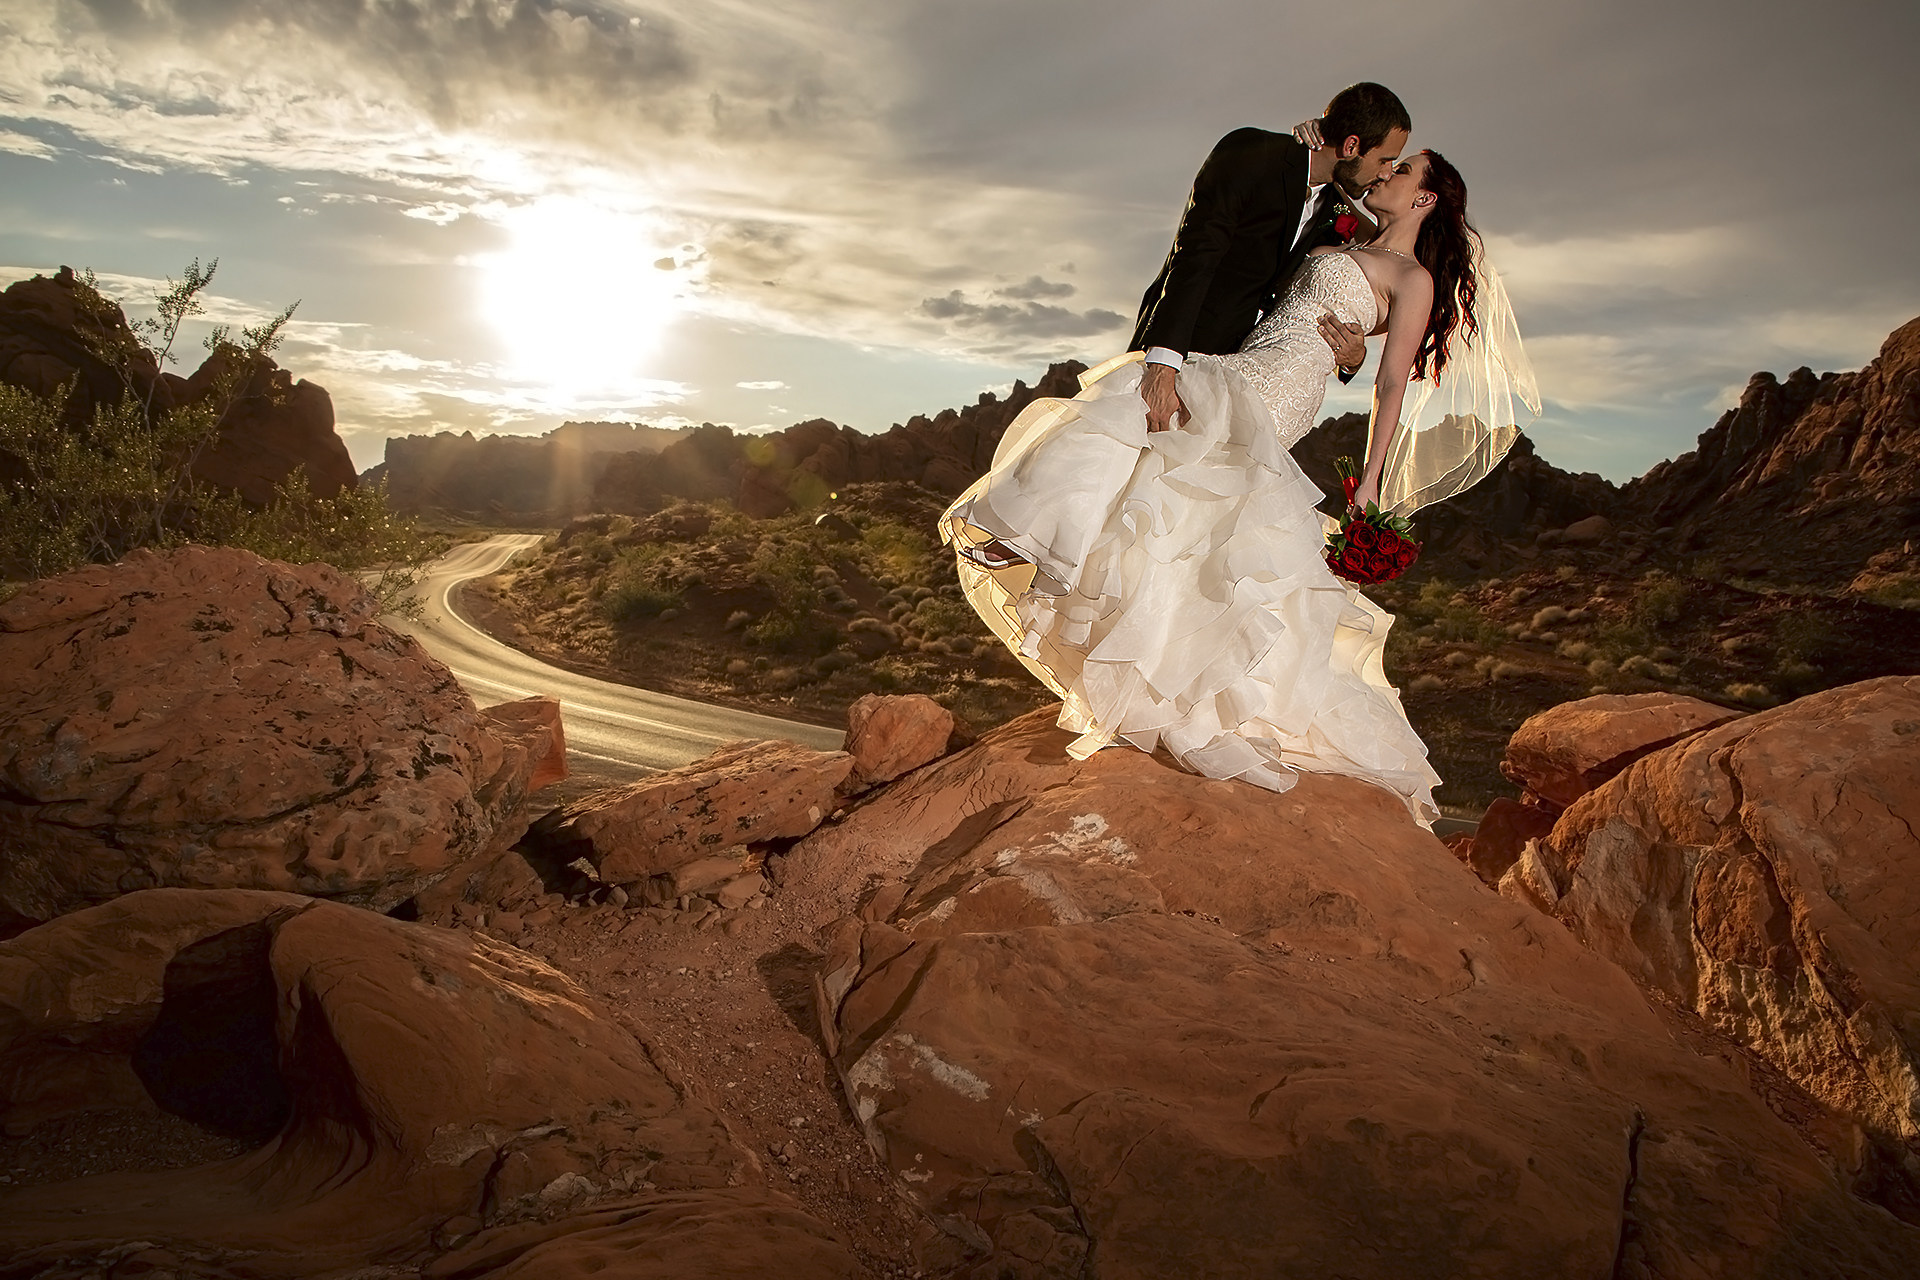 Las Vegas Wedding Photographer Sees An Unexpected Increase In Business Despite Covid 19